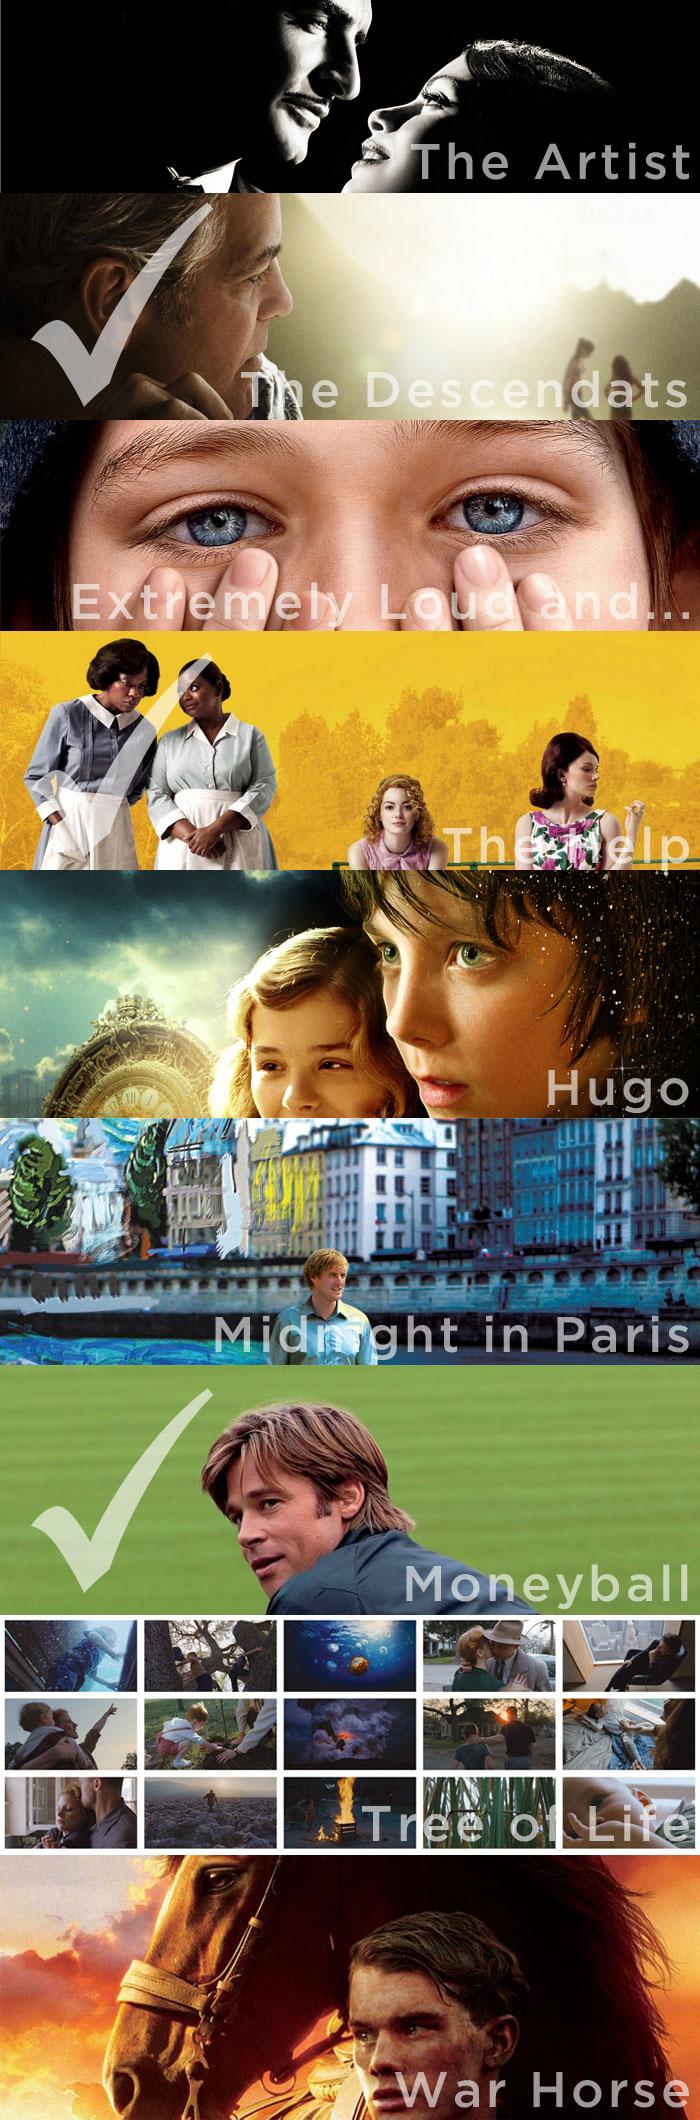 oscar_movies_2012